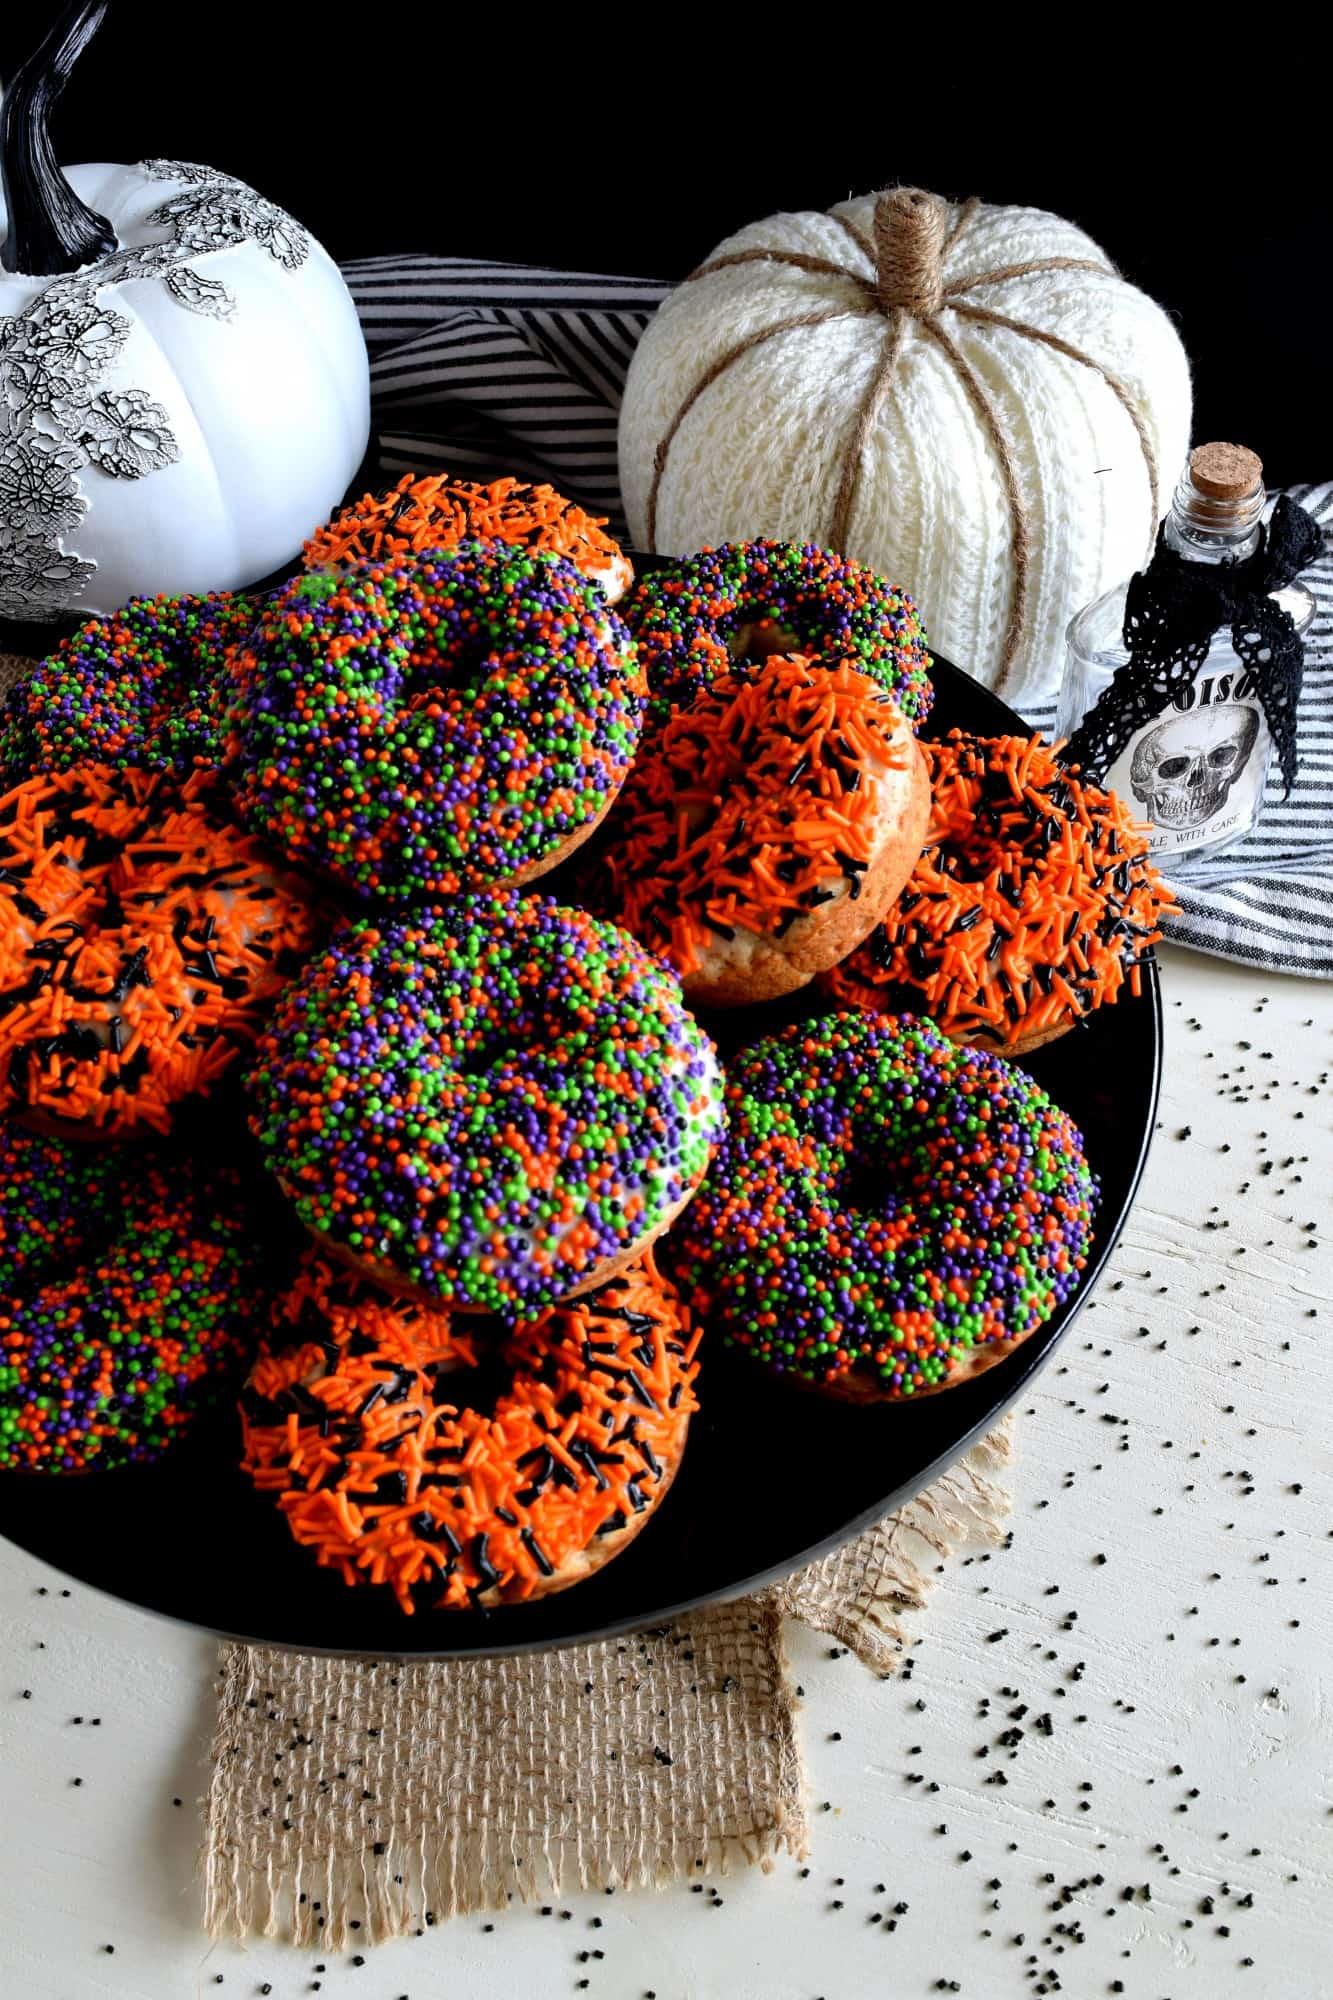 Pumpkin Spice Sour Cream Donuts